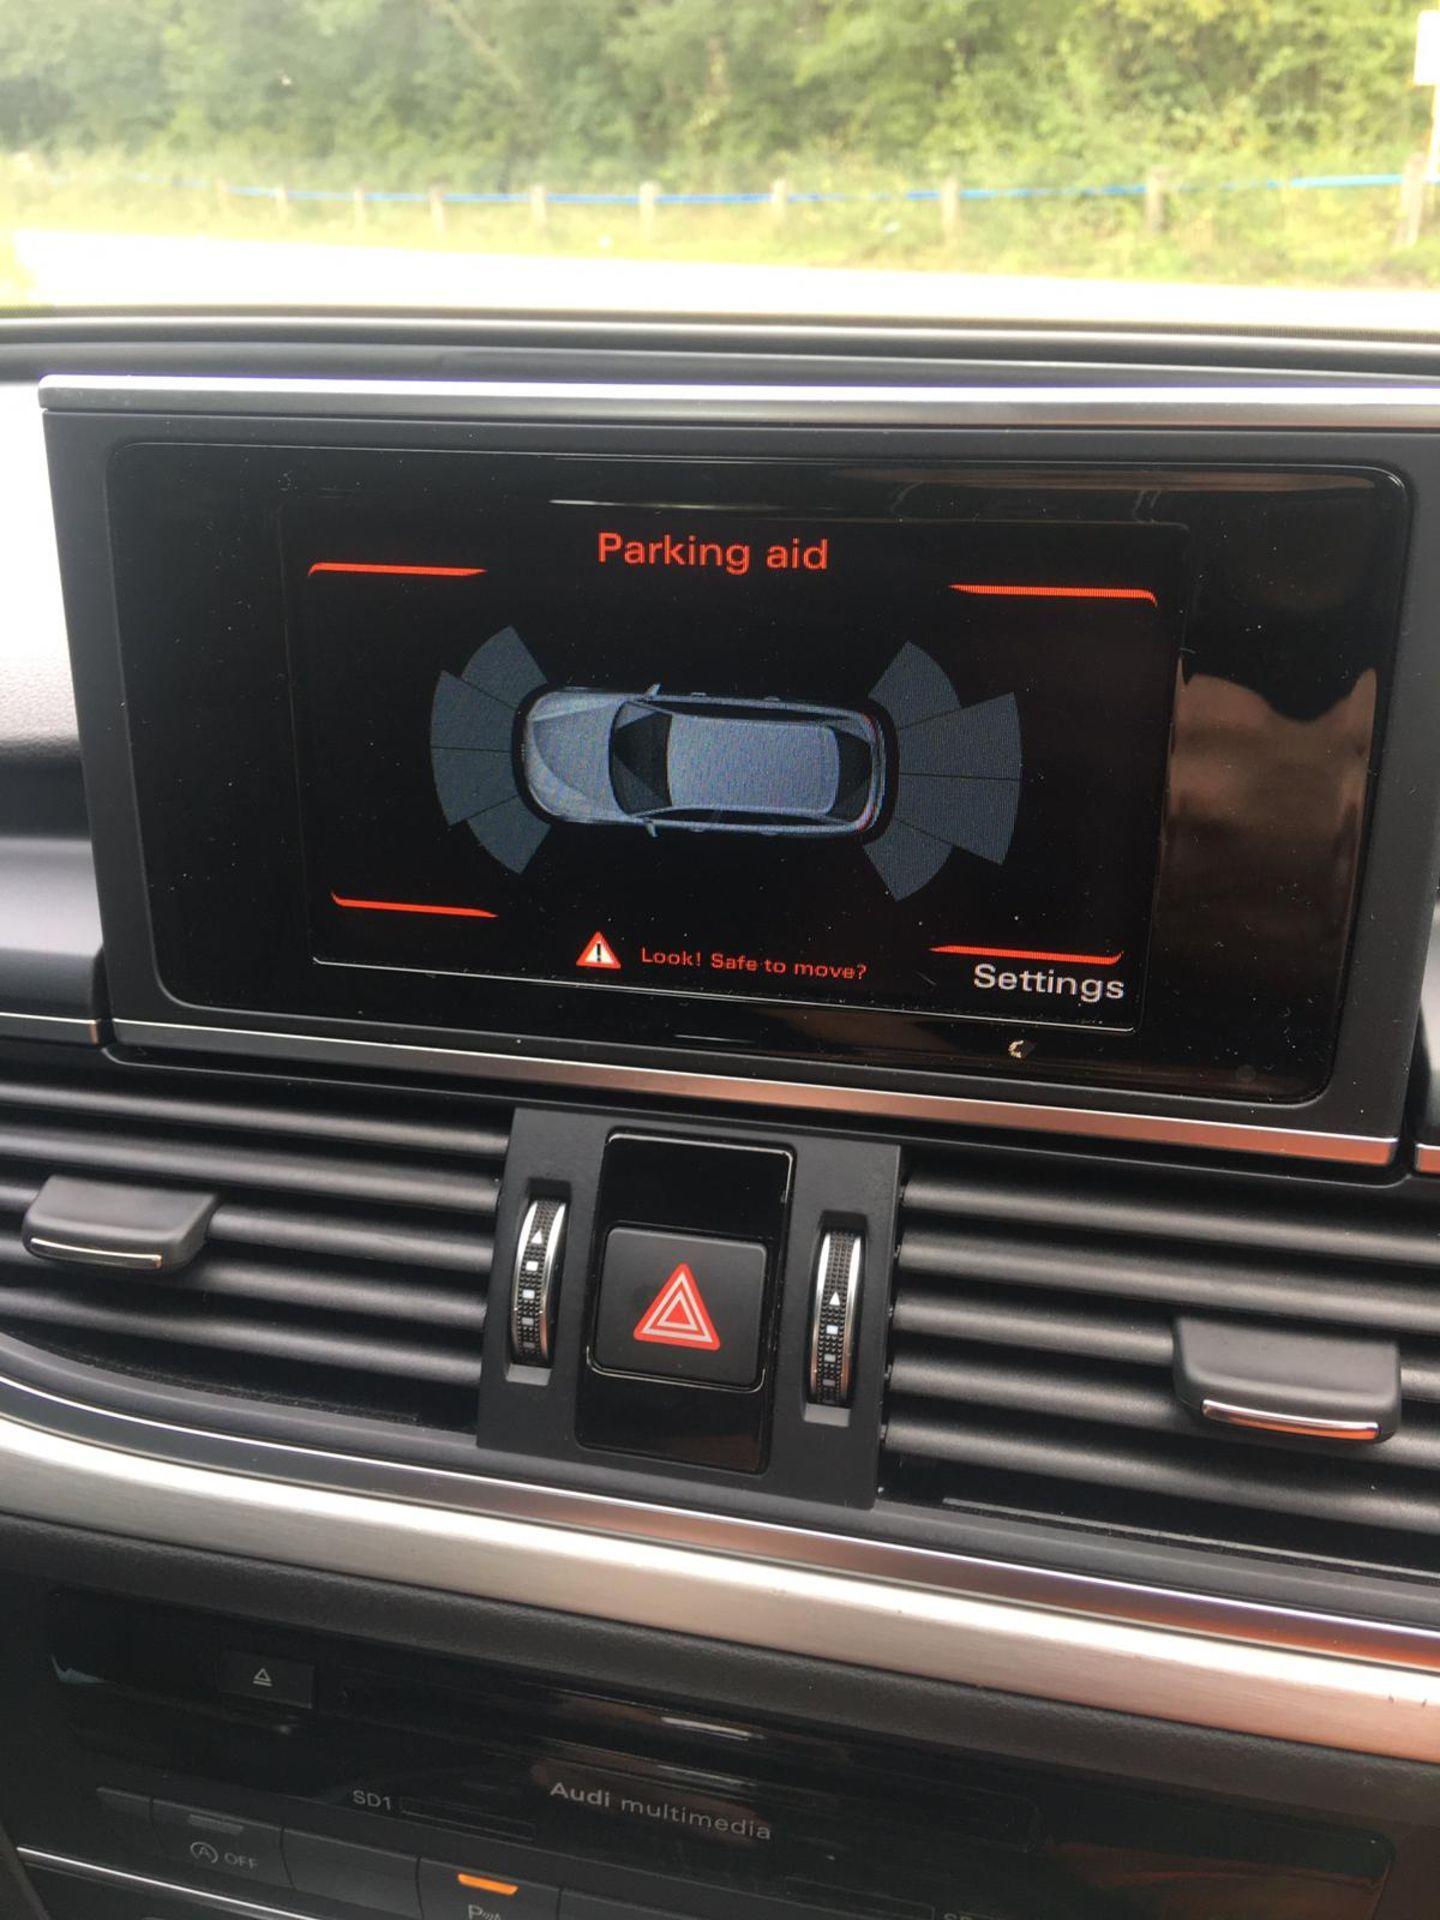 2018/18 REG AUDI A6 S LINE TDI ULTRA SEMI-AUTO 2.0 DIESEL ESTATE, SHOWING 1 FORMER KEEPER *NO VAT* - Image 26 of 33